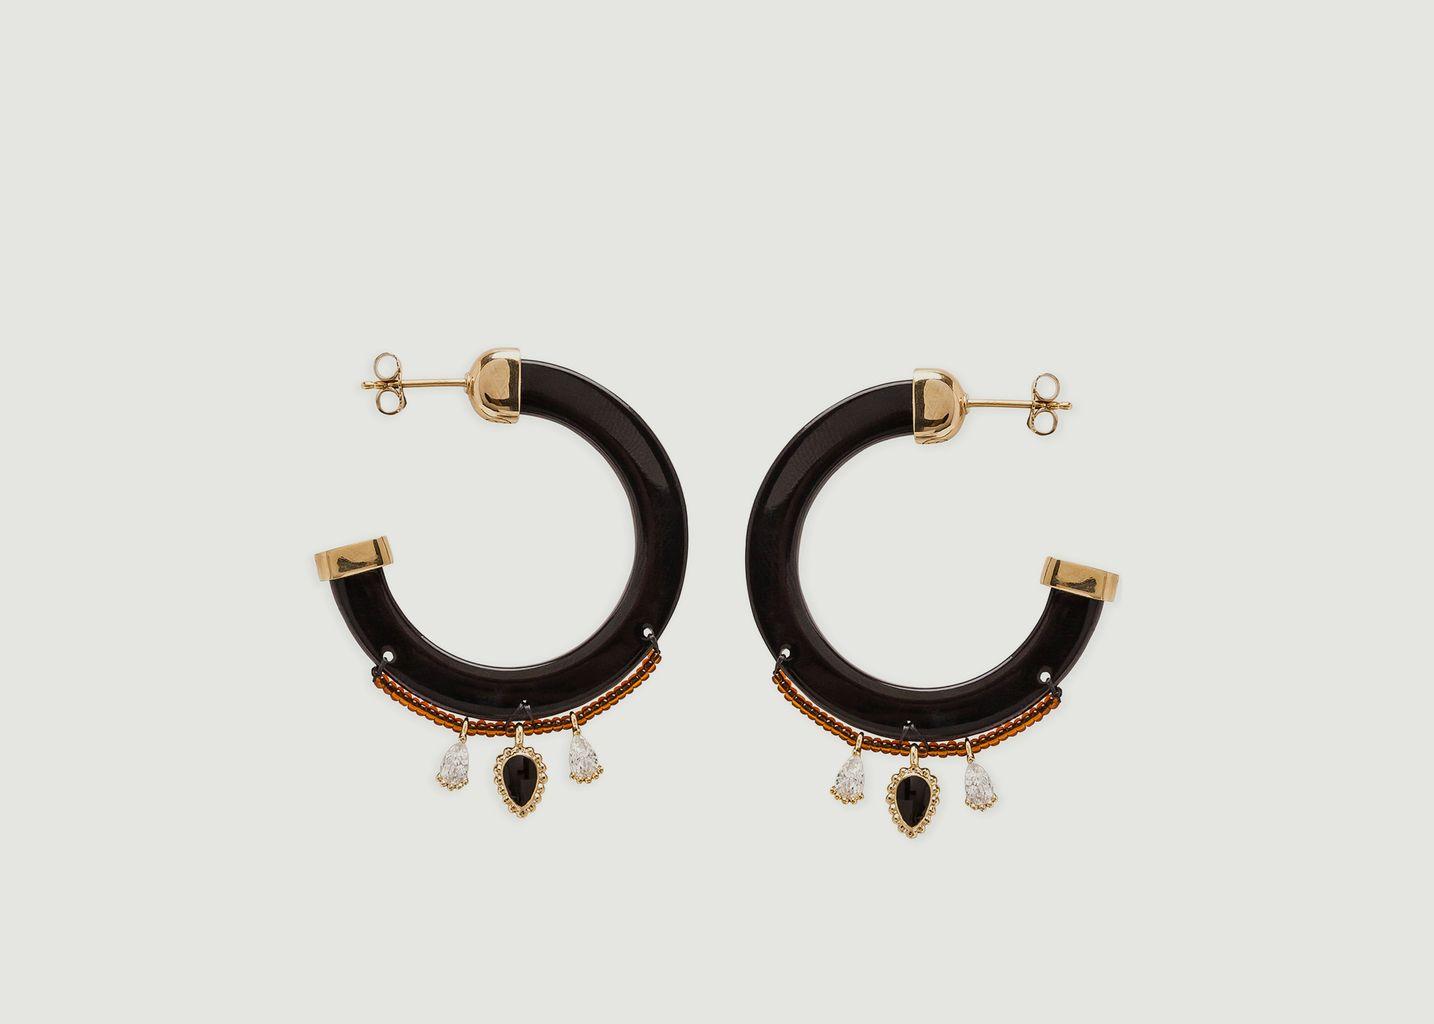 Boucles d'oreilles Flavia - Hipanema